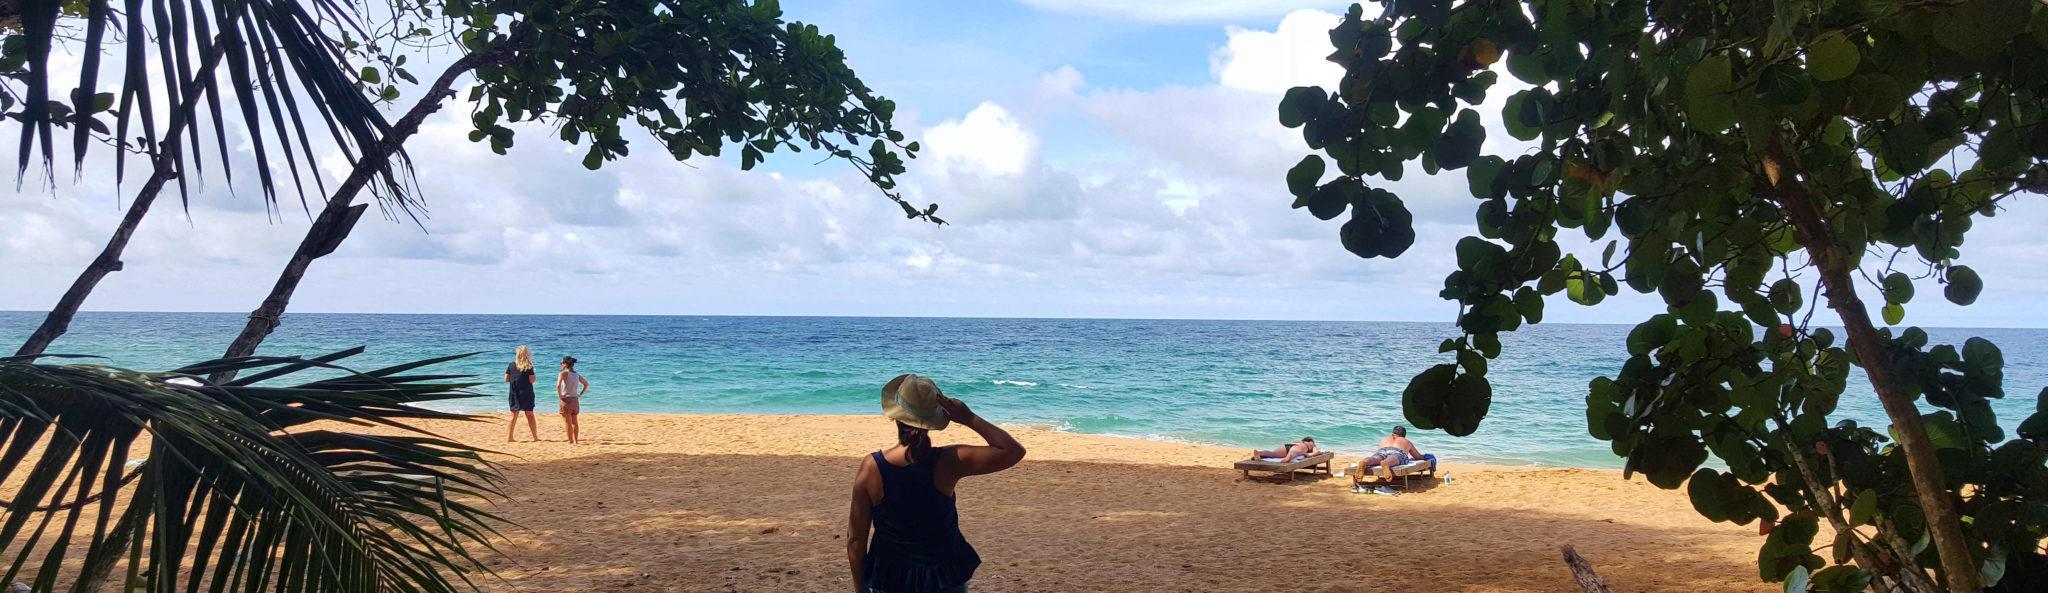 Praia Bluff - Panamá © Viaje Comigo